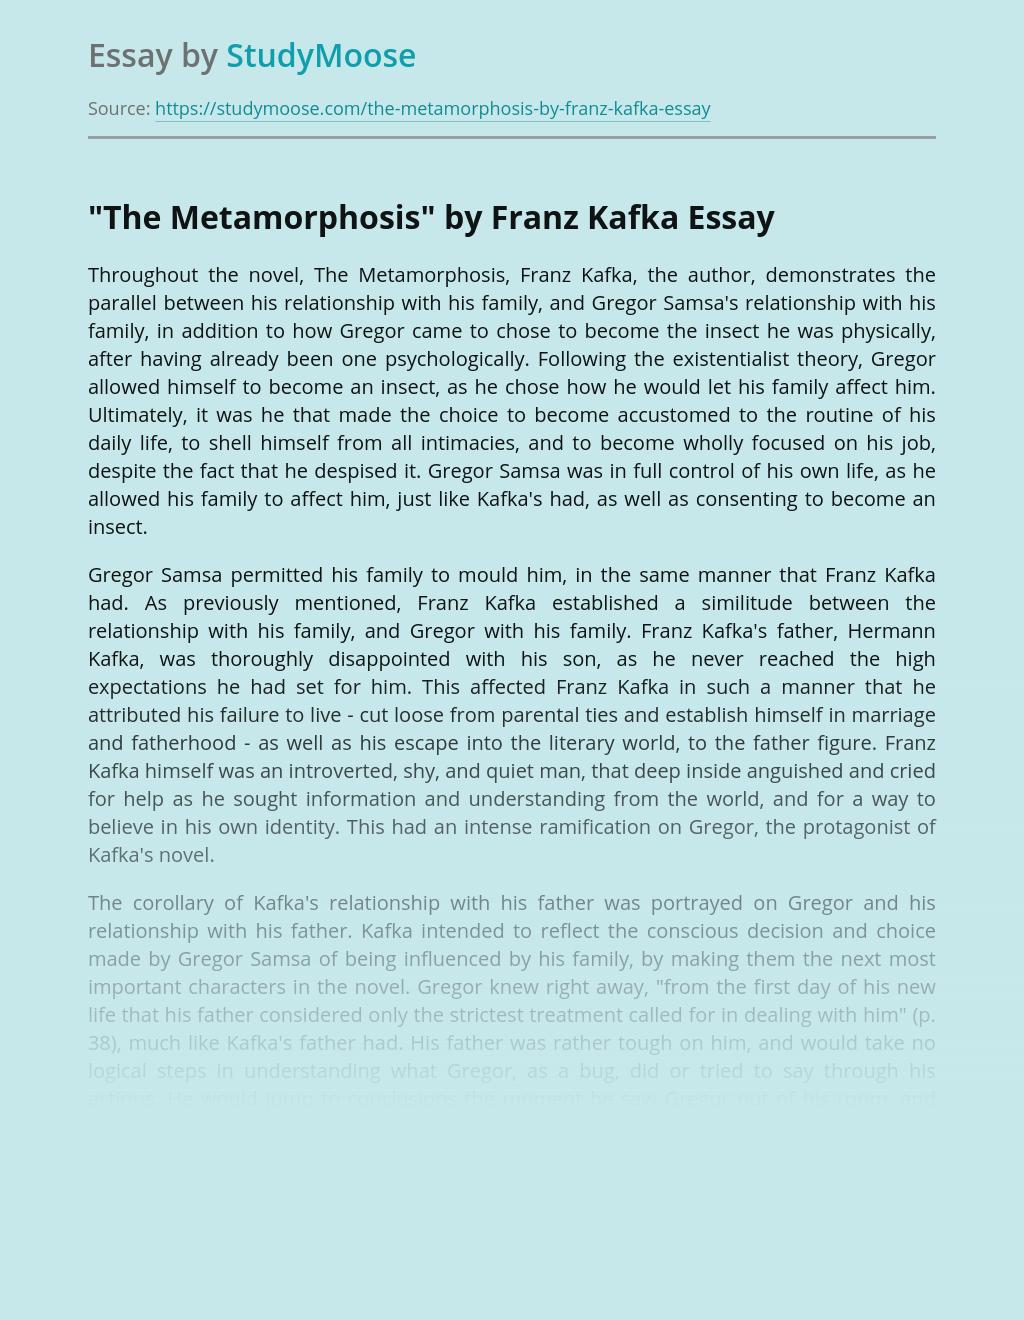 """The Metamorphosis"" by Franz Kafka: Origins and Parallels"